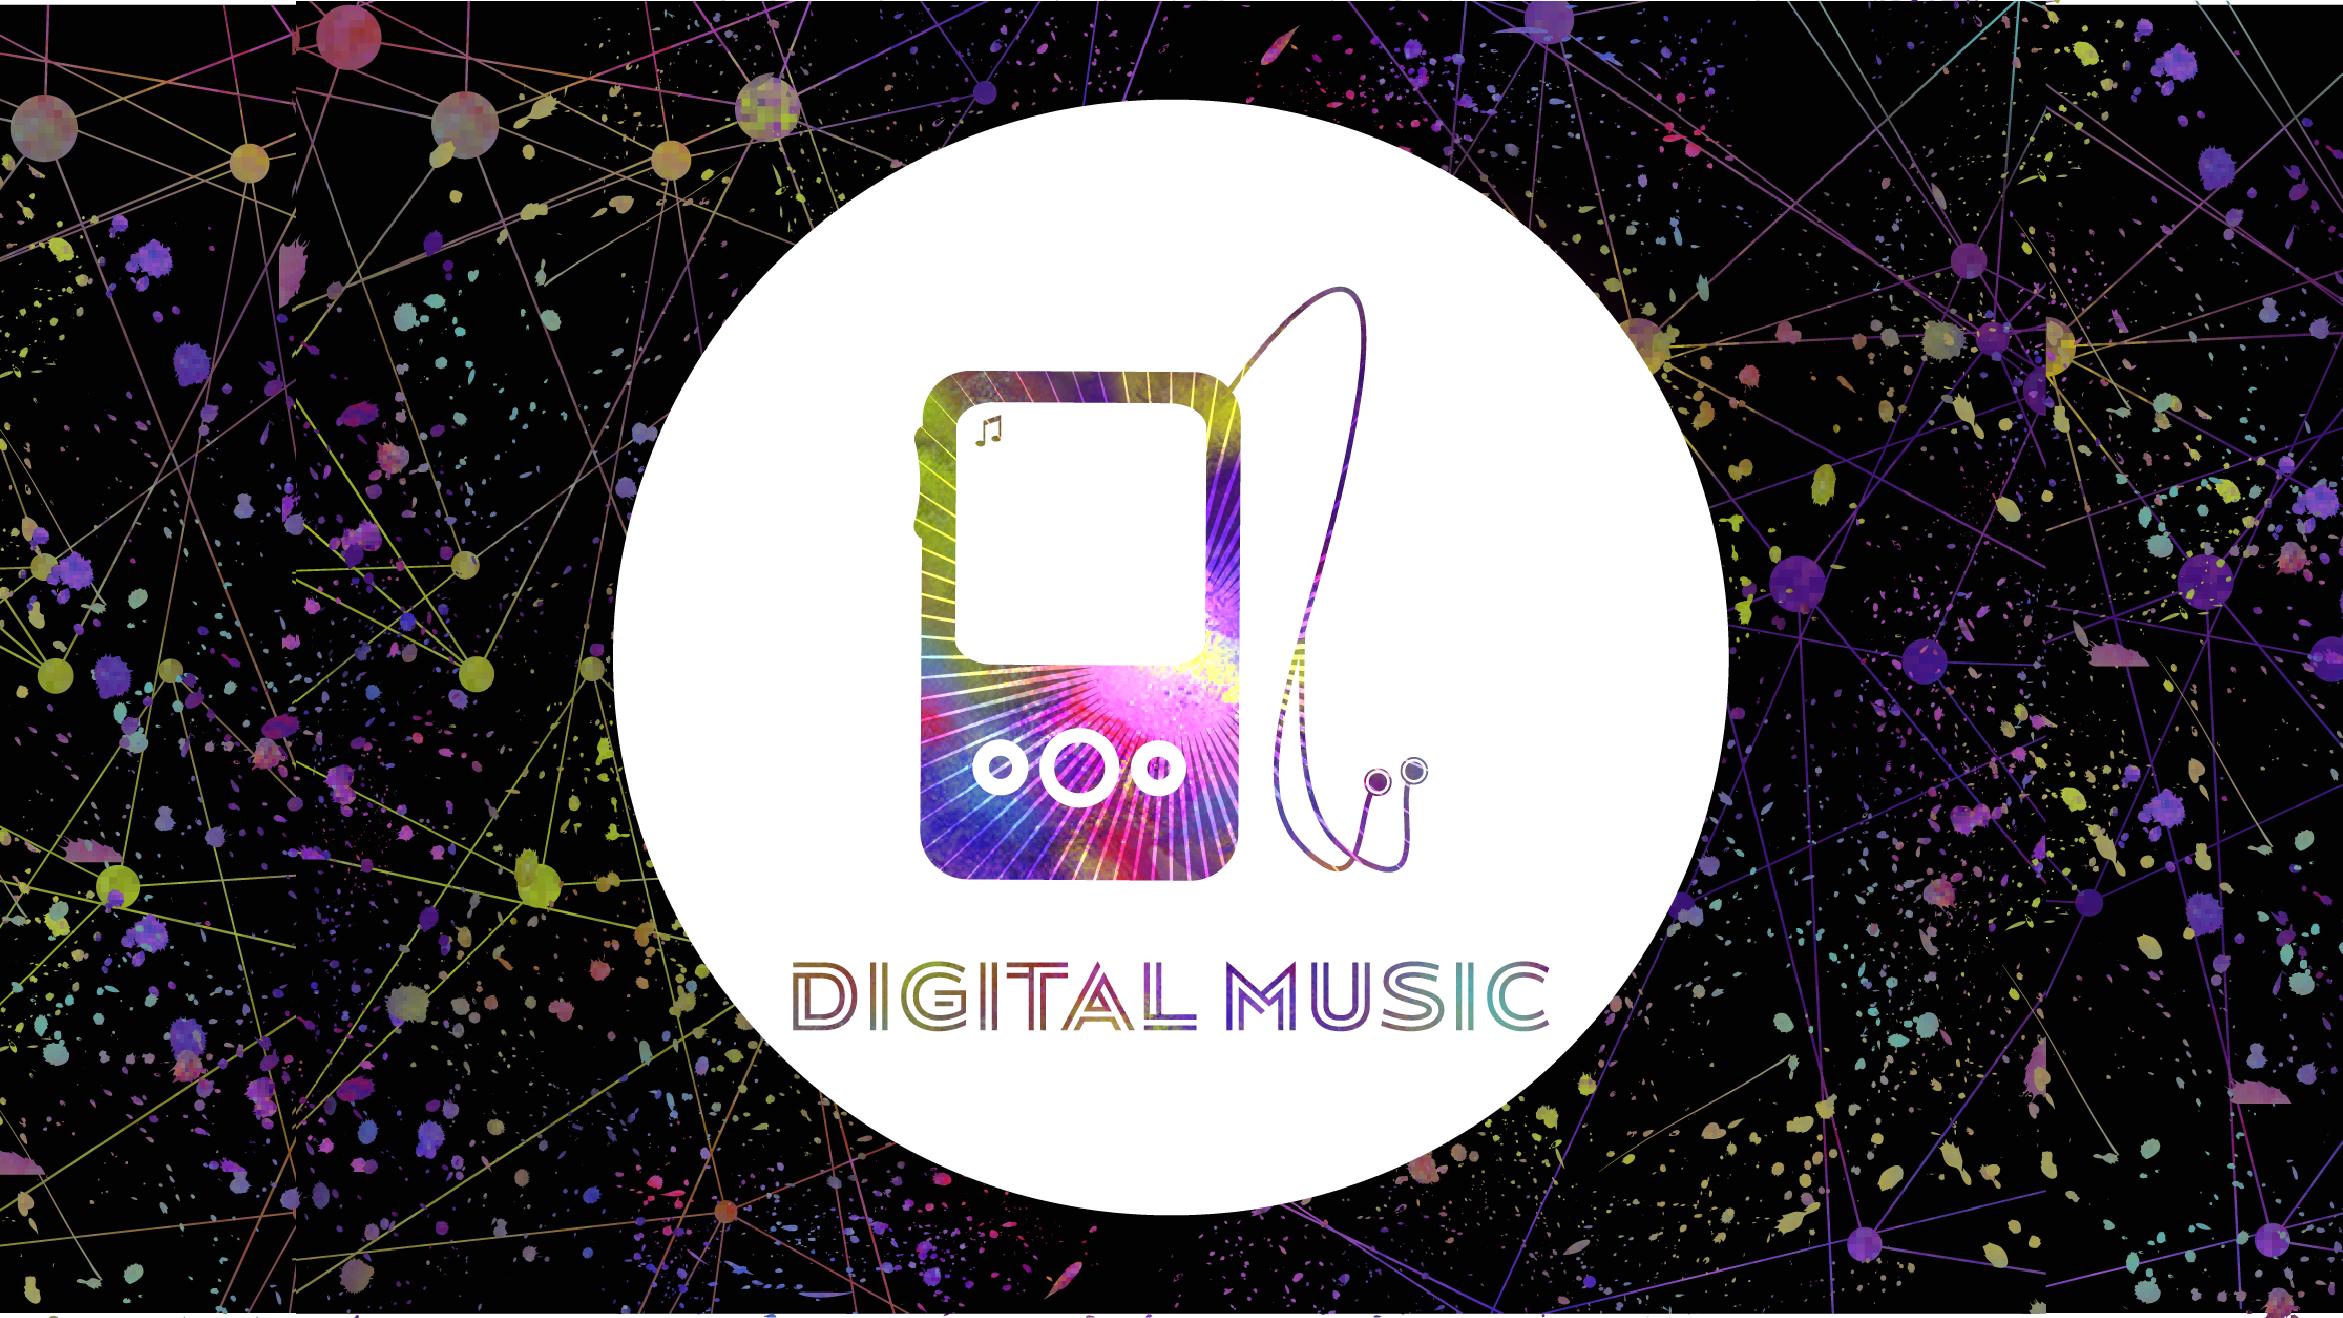 digital2_Plan_de_travail_1-1524389575.png